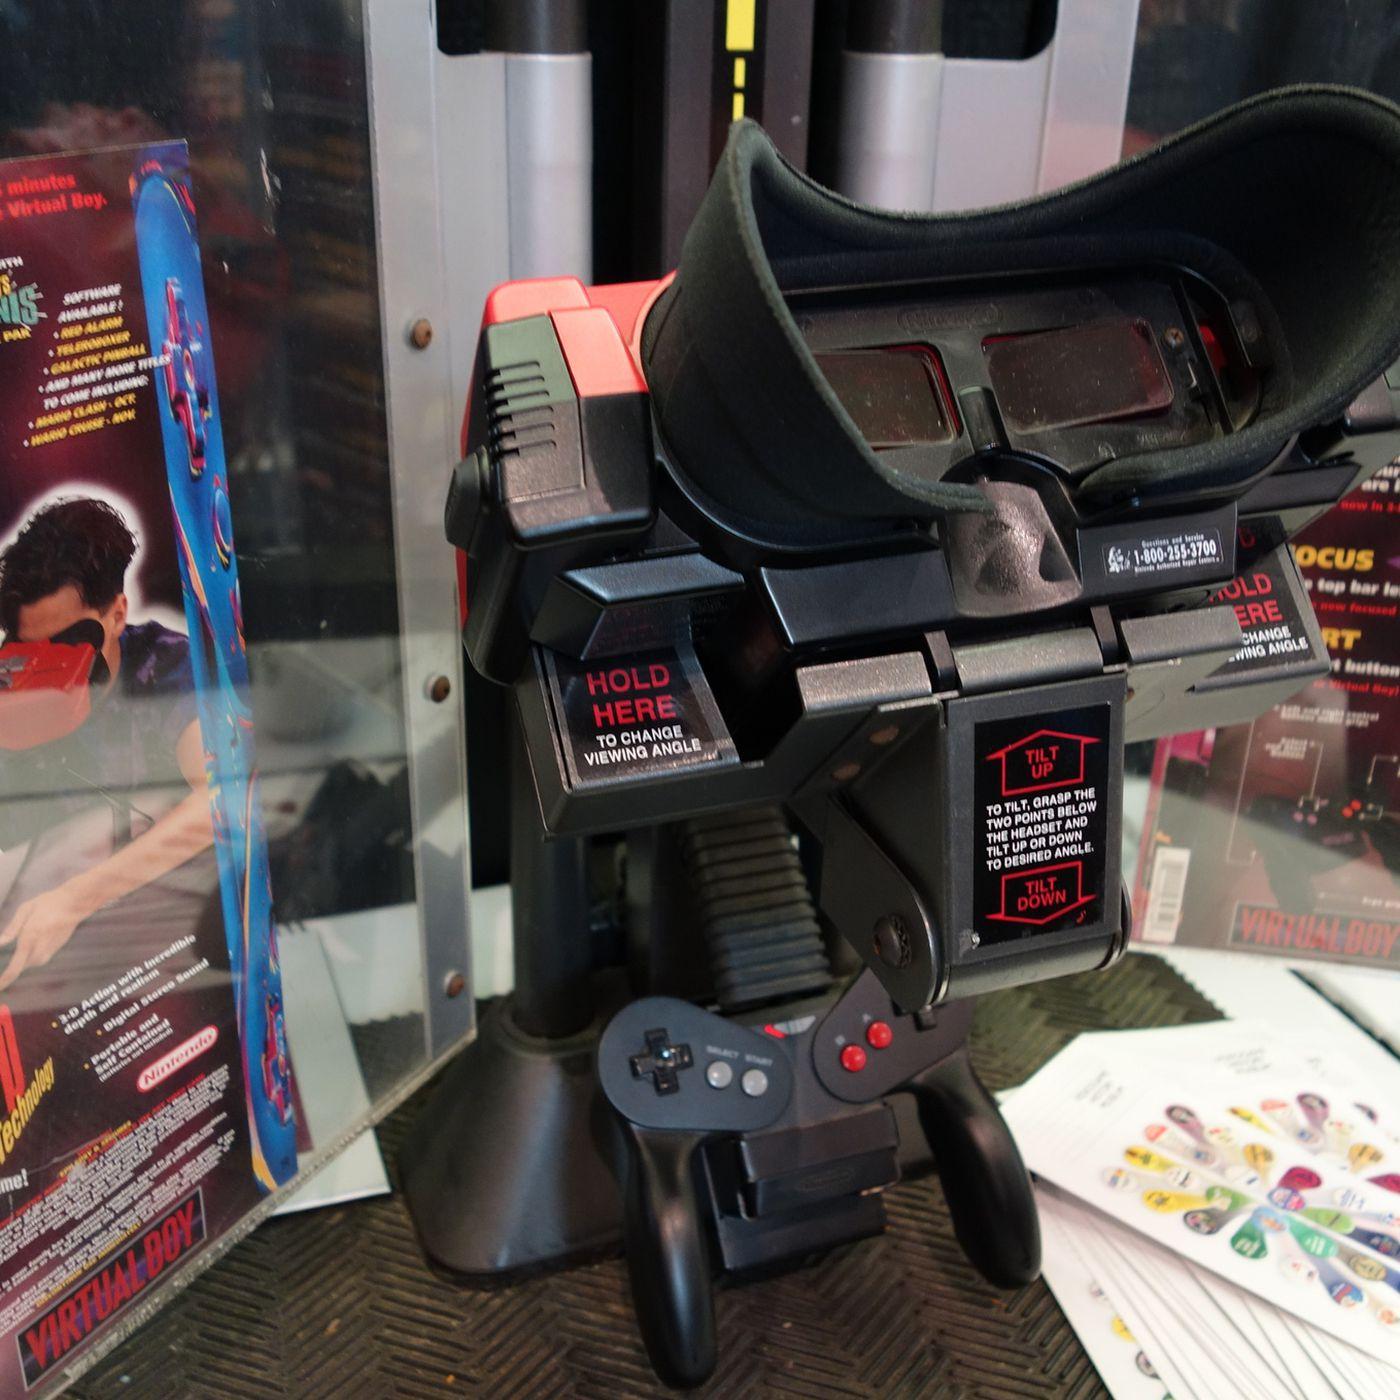 Unofficial Virtual Boy emulator brings Nintendo games to